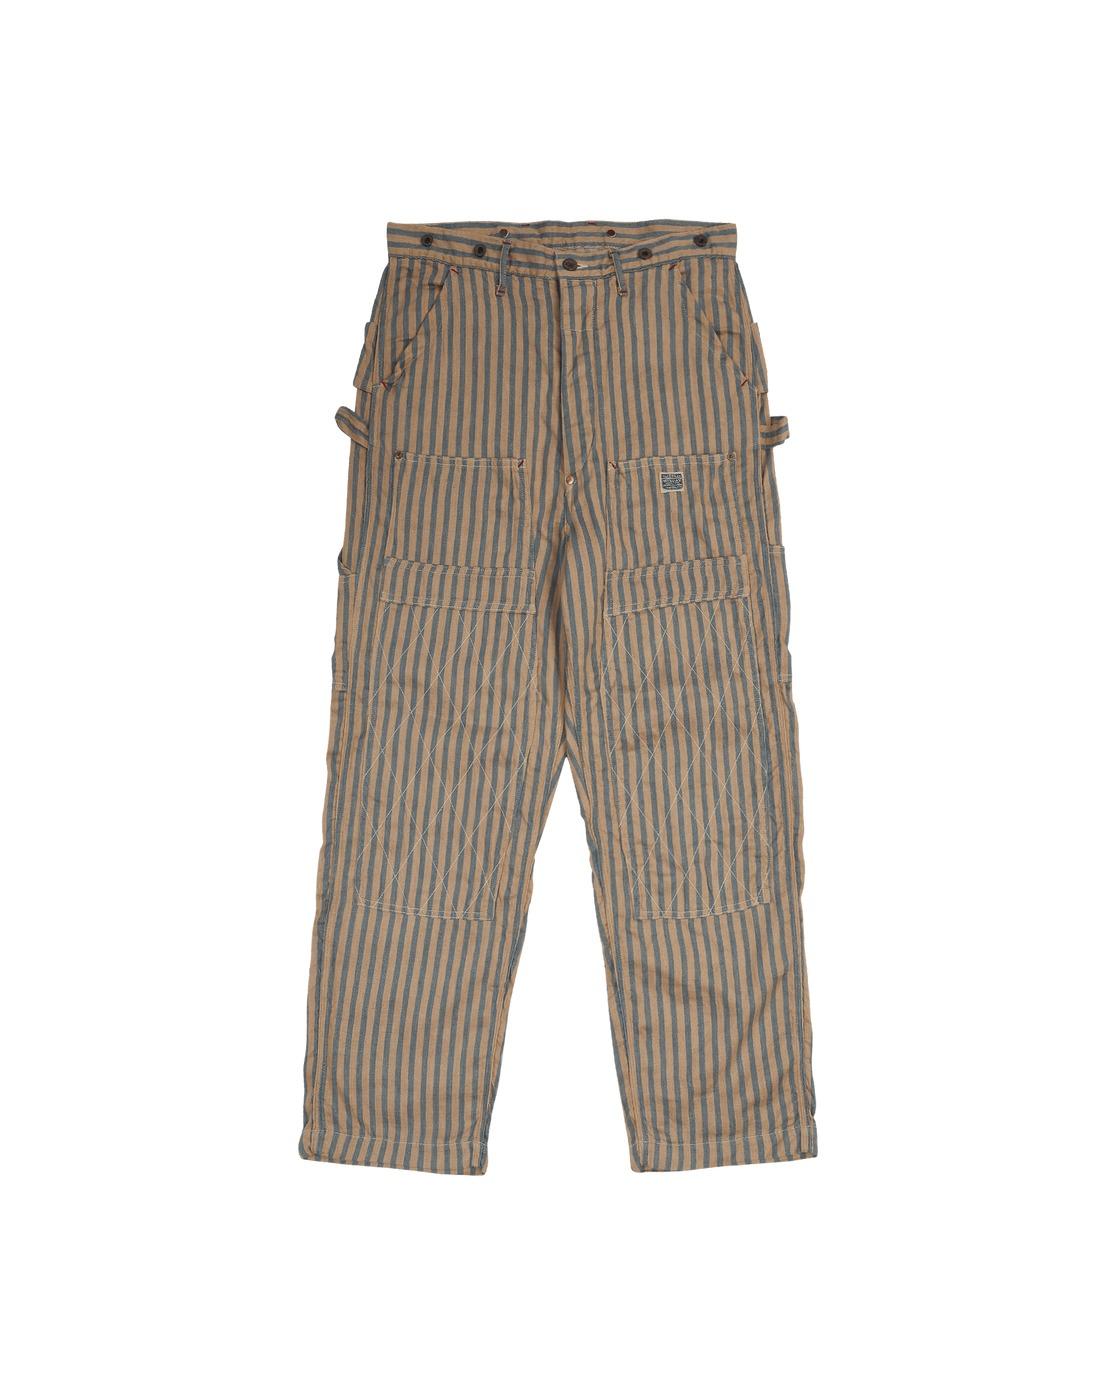 Kapital Linen Blues Hickoree Lumber Pants Beige